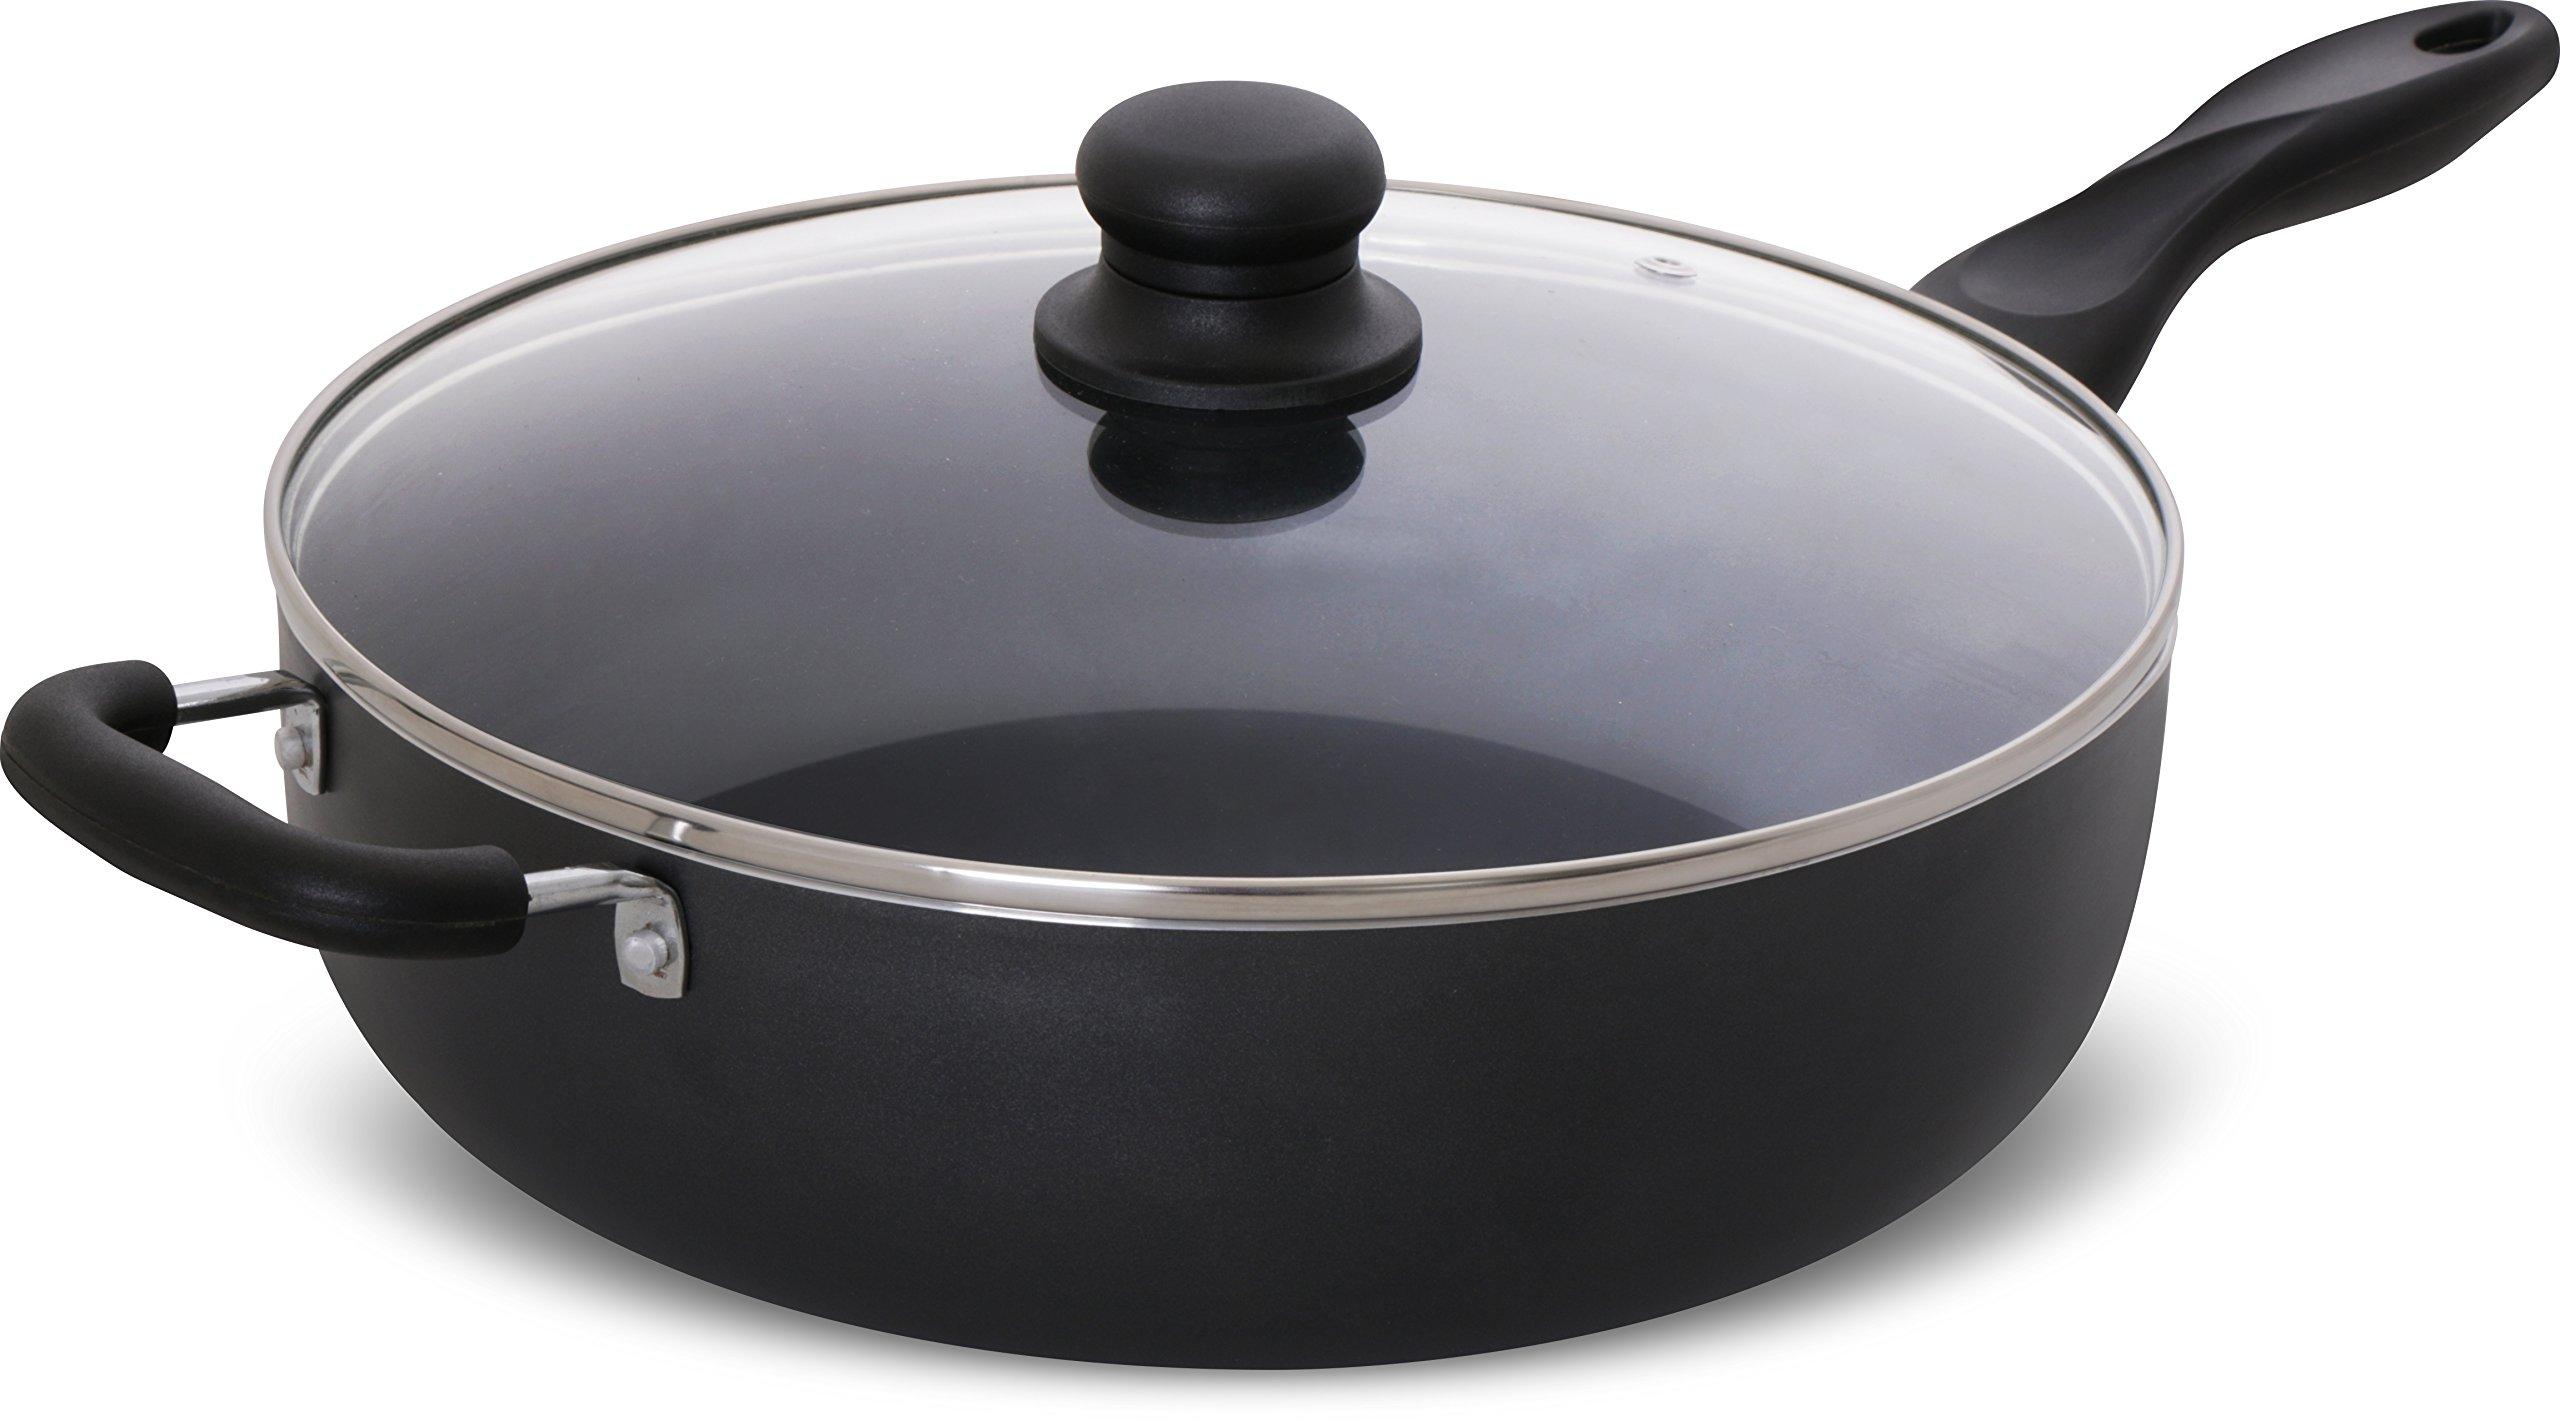 Utopia Kitchen - 11 Inch Nonstick Deep Frying Pan - 4.6 Quart Sauté Pan - Aluminum Jumbo Cooker with Glass Lid - Dishwasher Safe by Utopia Kitchen (Image #2)